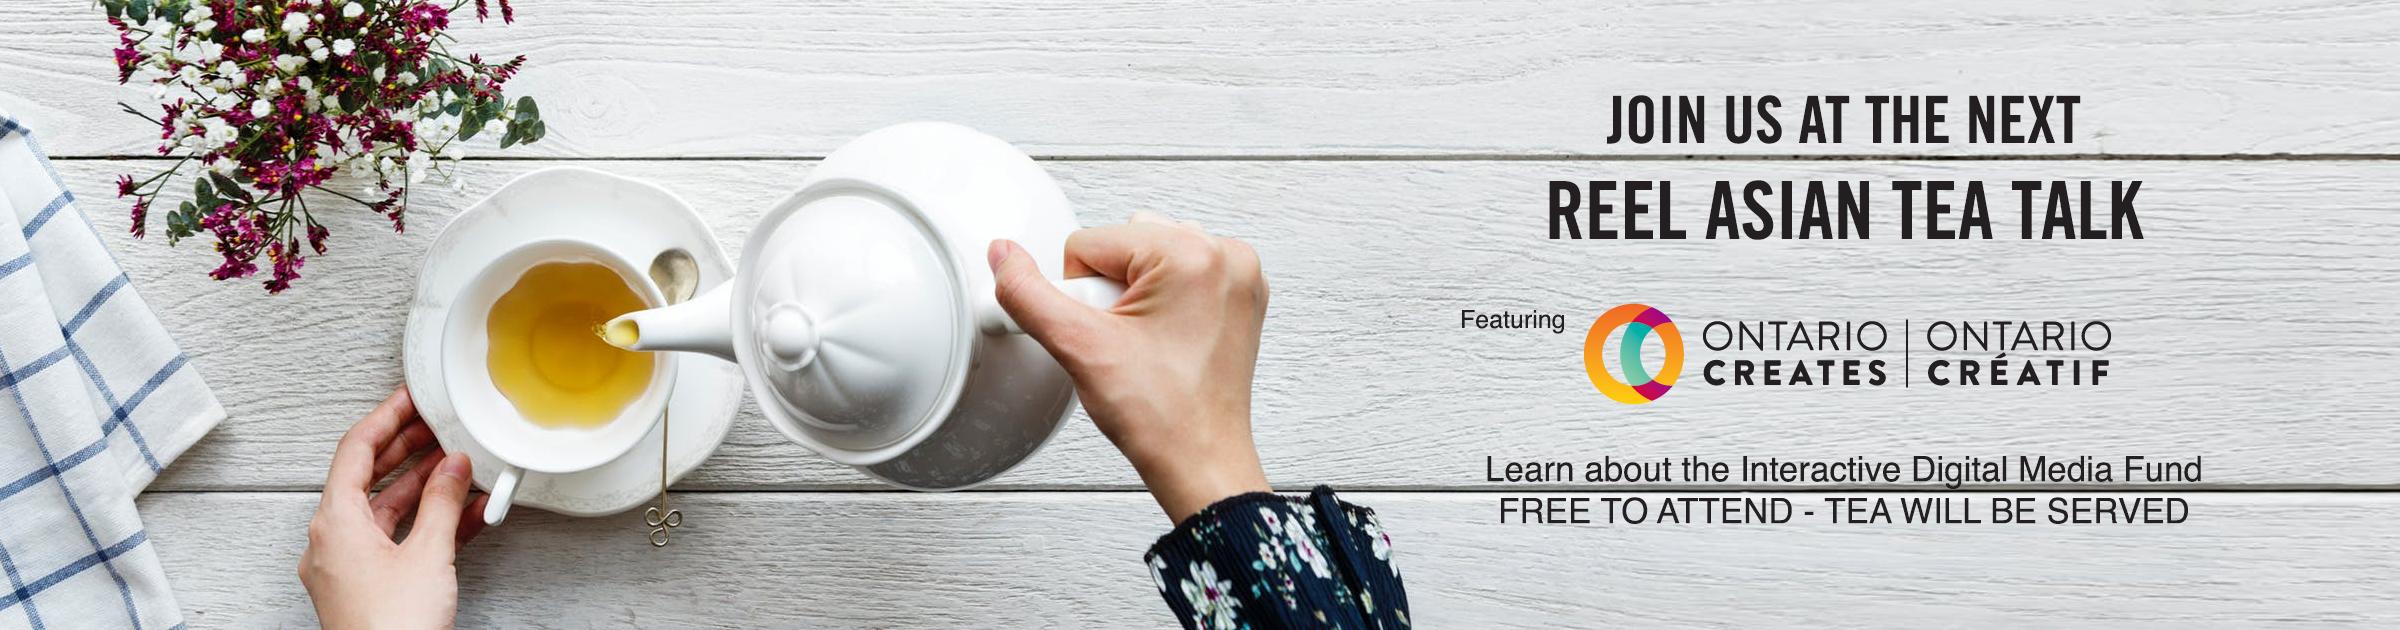 Tea Talk Website Banner